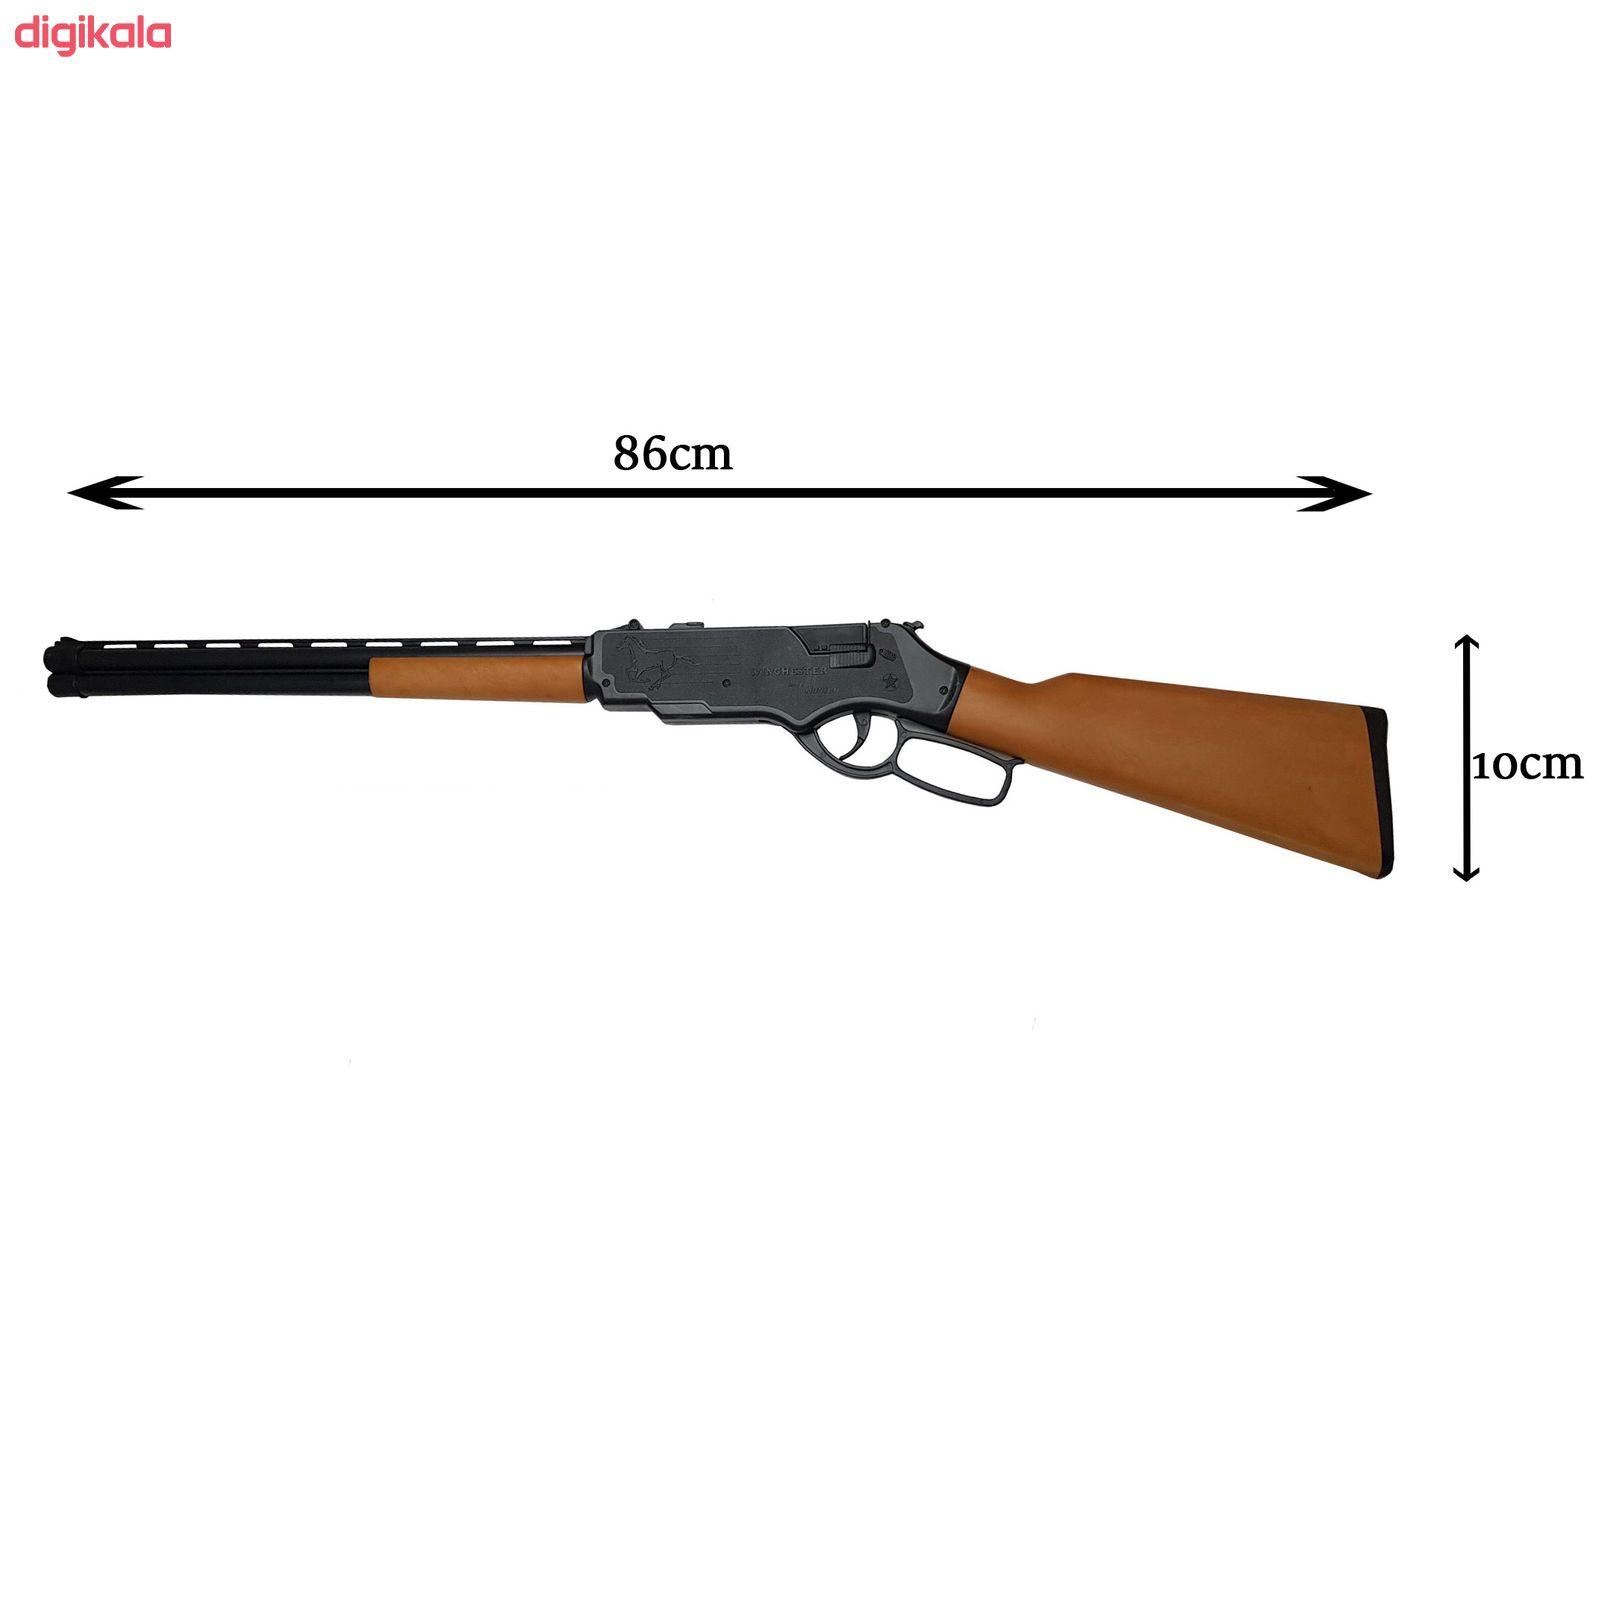 تفنگ بازی گلدن گان مدل naabsell-p100 مجموعه 4 عددی main 1 3